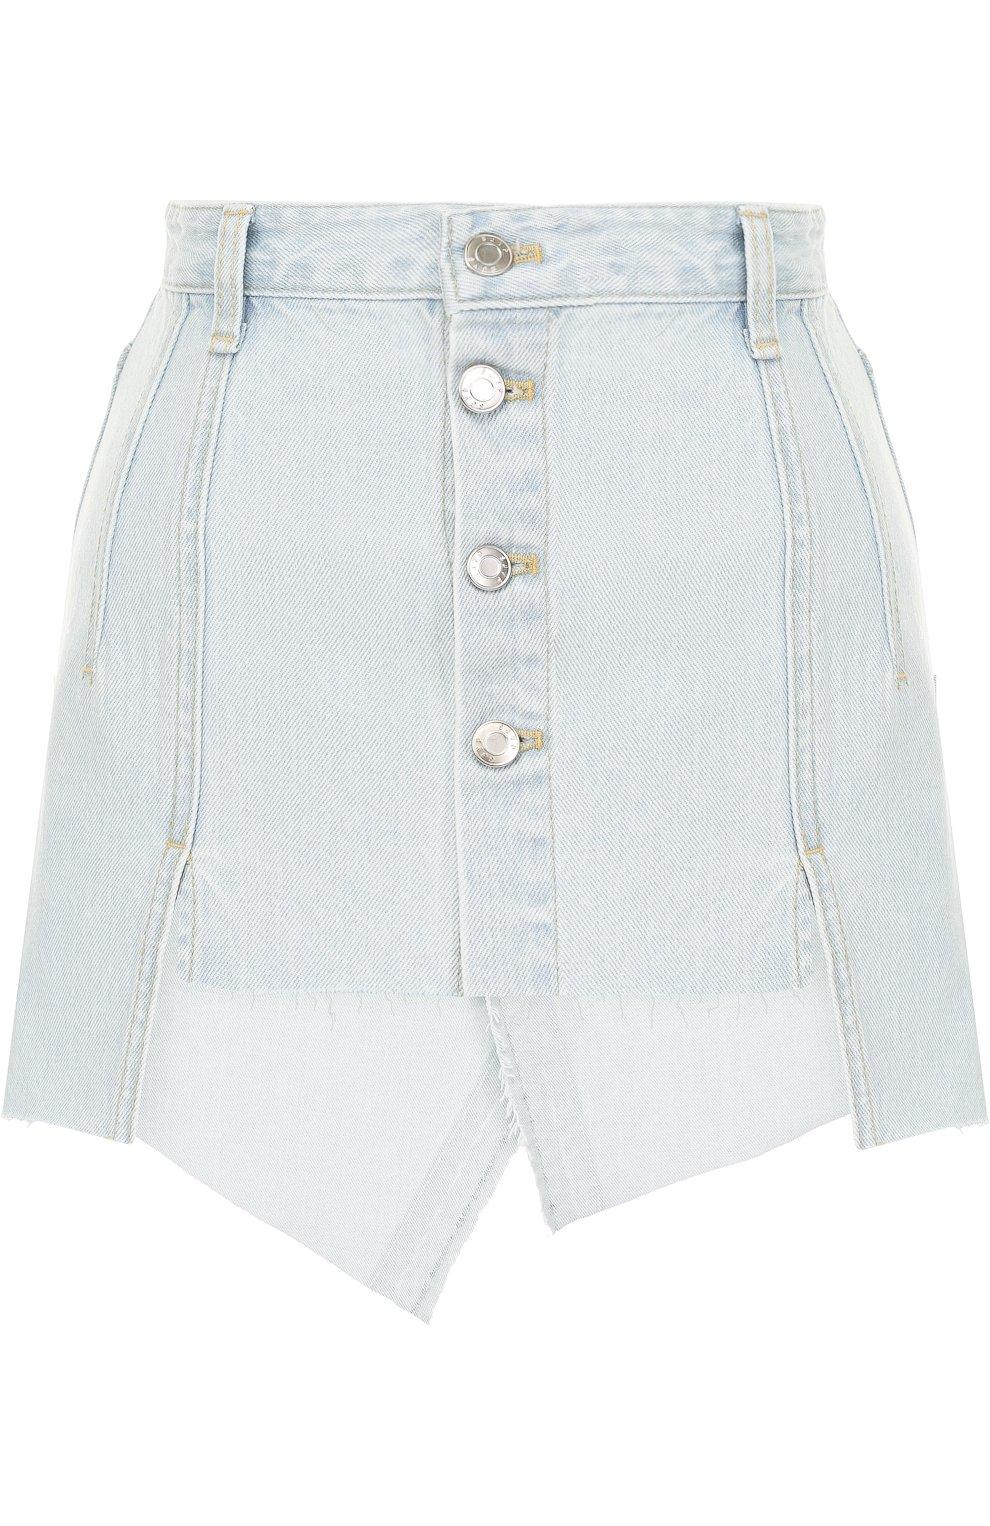 Женская джинсовая мини-юбка с потертостями STEVE J & YONI P голубого цвета, арт. PWMS2D-S01900   Фото 1